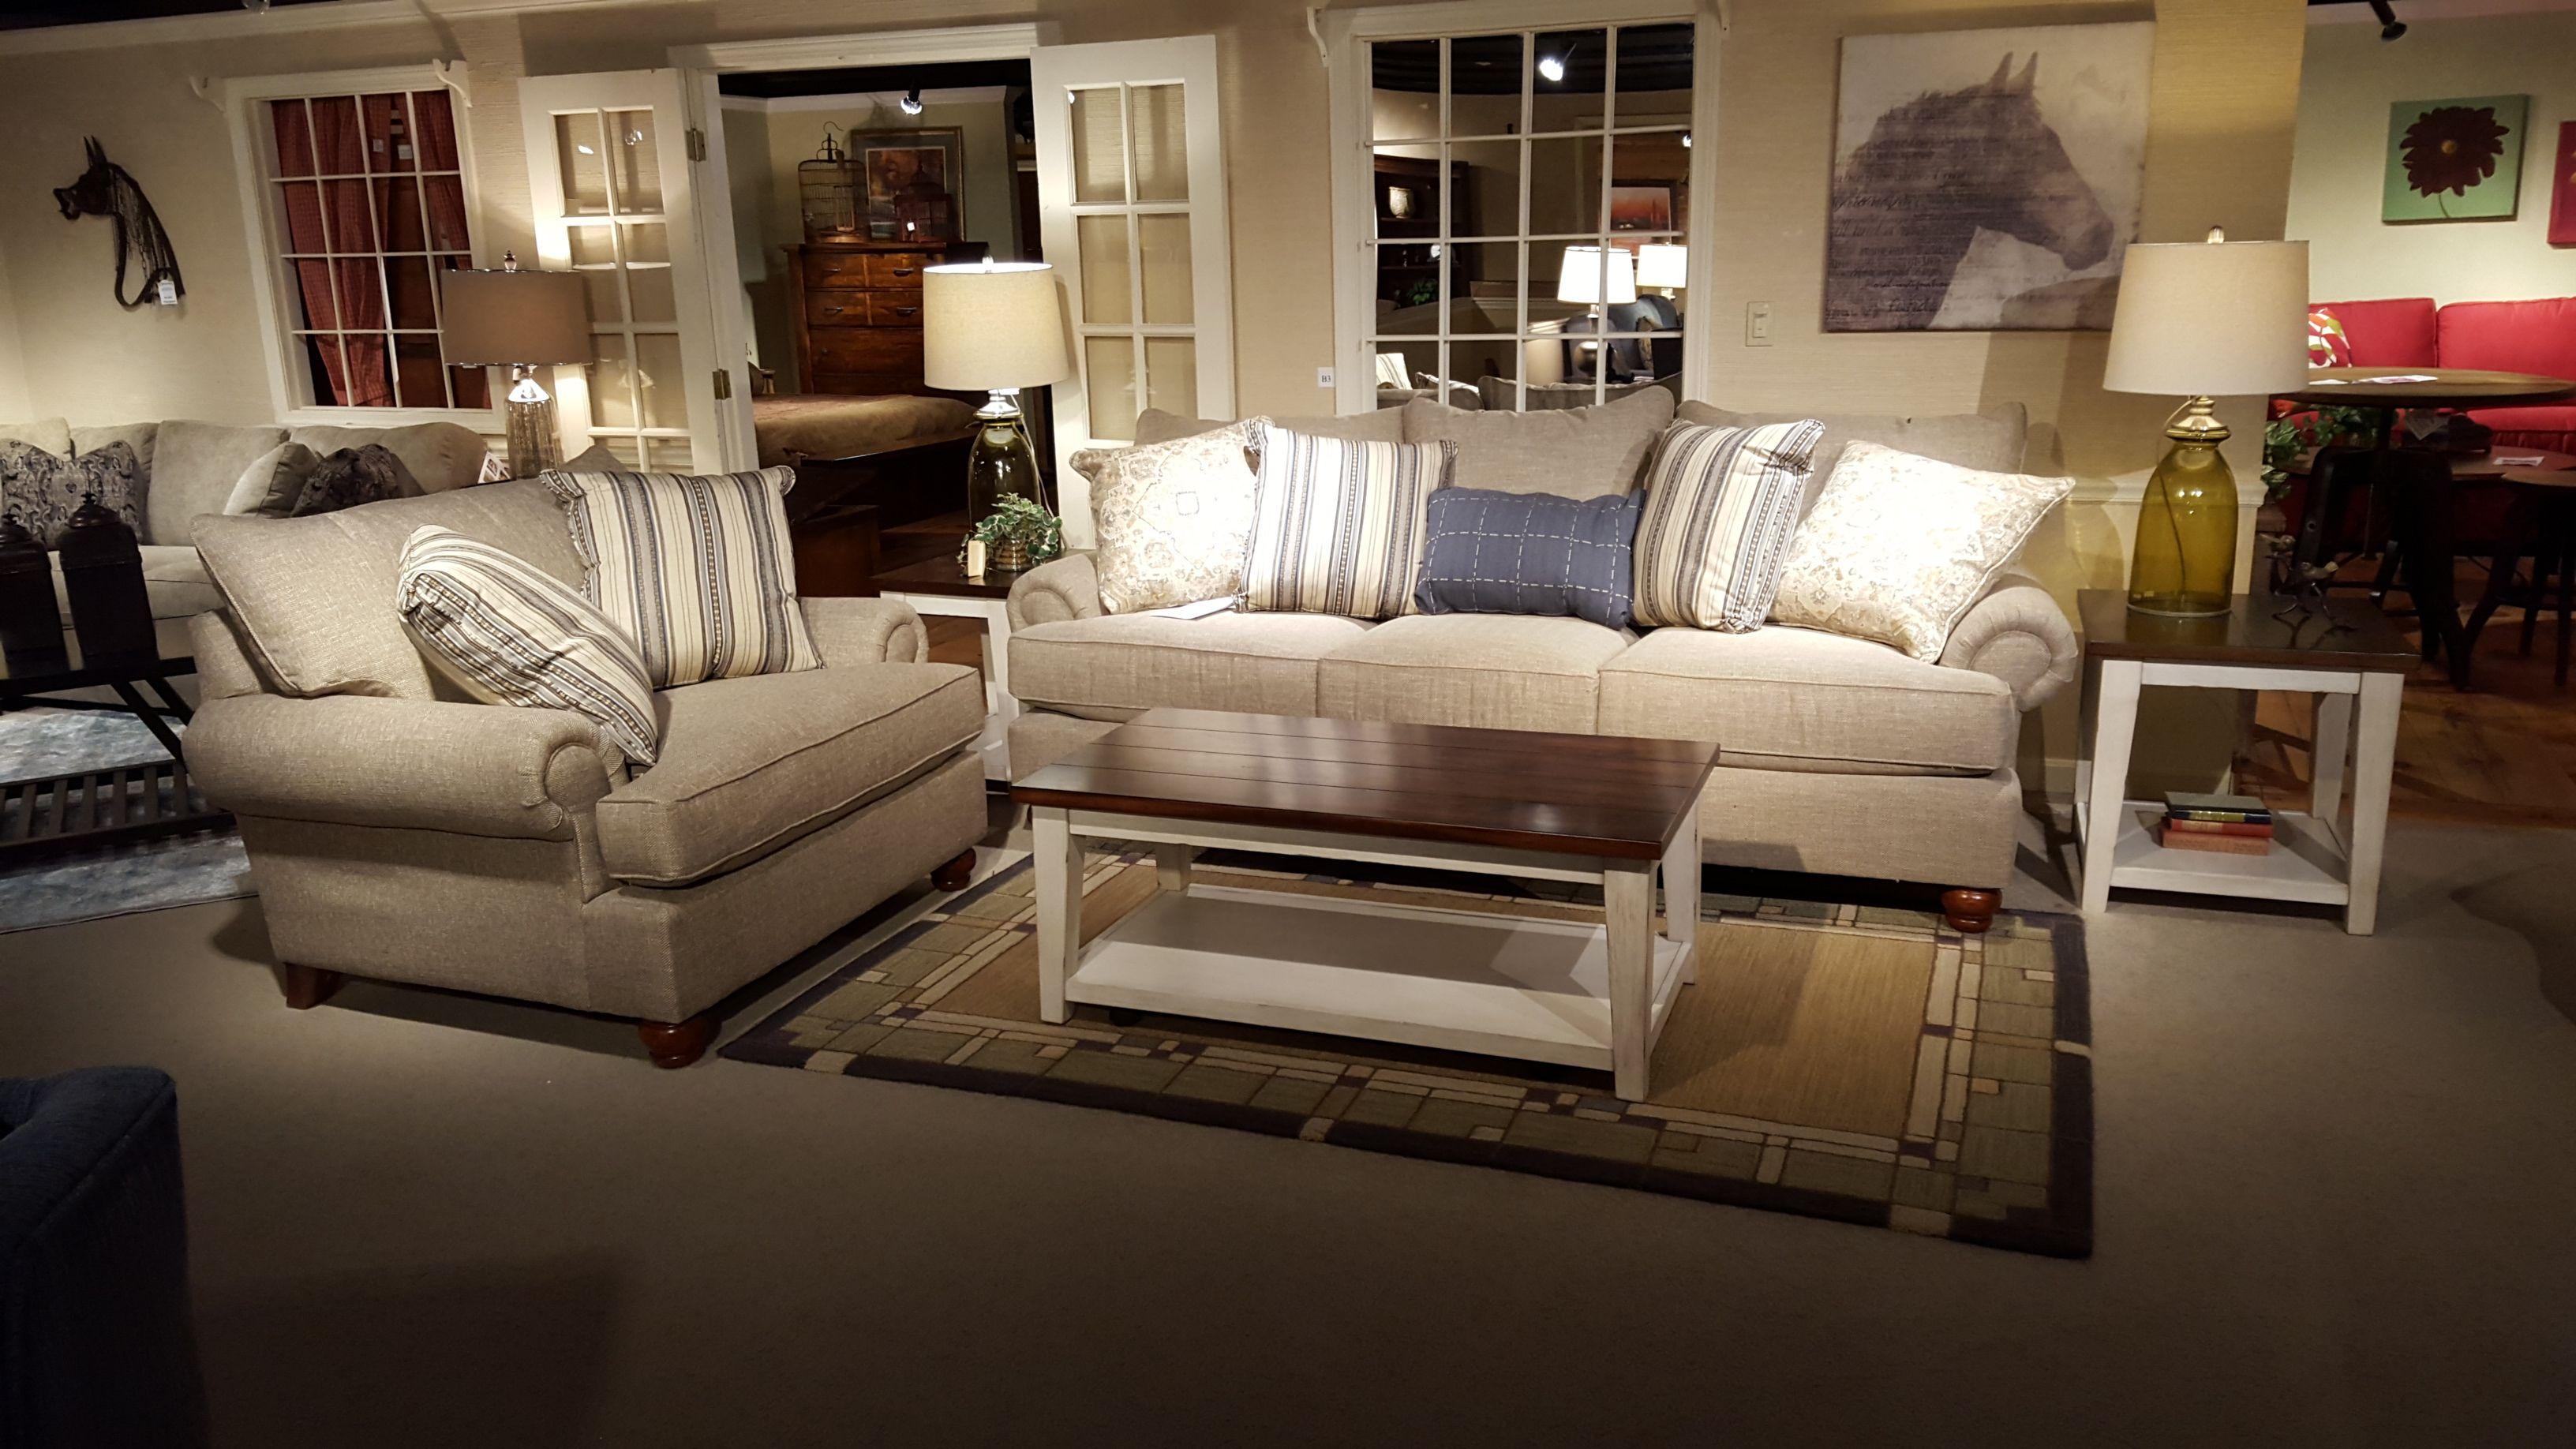 11 Smart Designs Of How To Make 3 Piece Living Room Set Cheap In 2021 Living Room Sets Furniture 3 Piece Living Room Set Living room piece sets